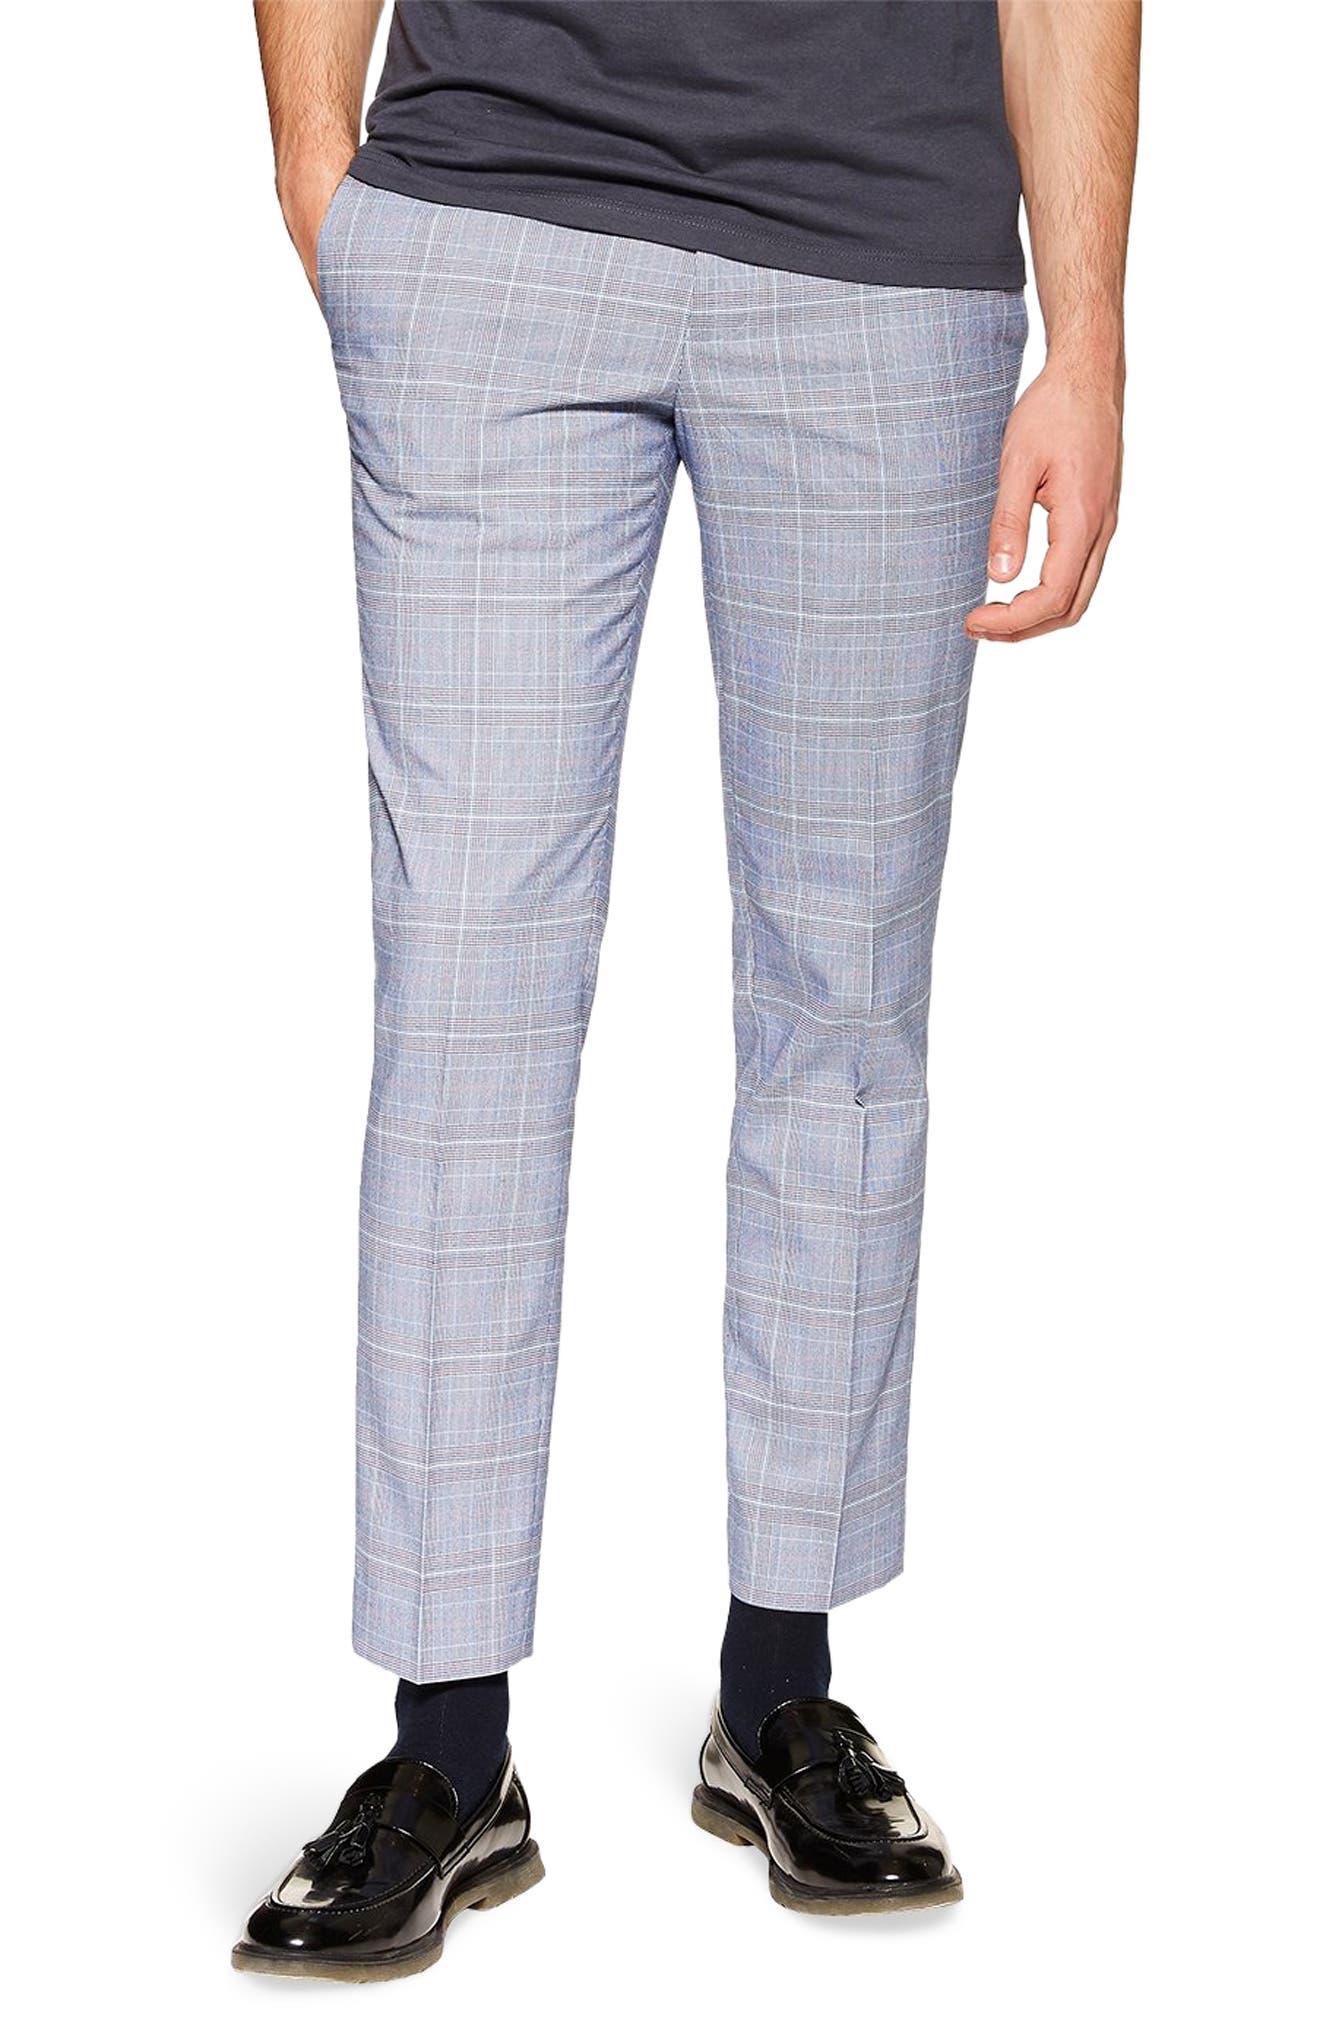 TOPMAN Skinny Fit Plaid Trousers, Main, color, BLUE MULTI